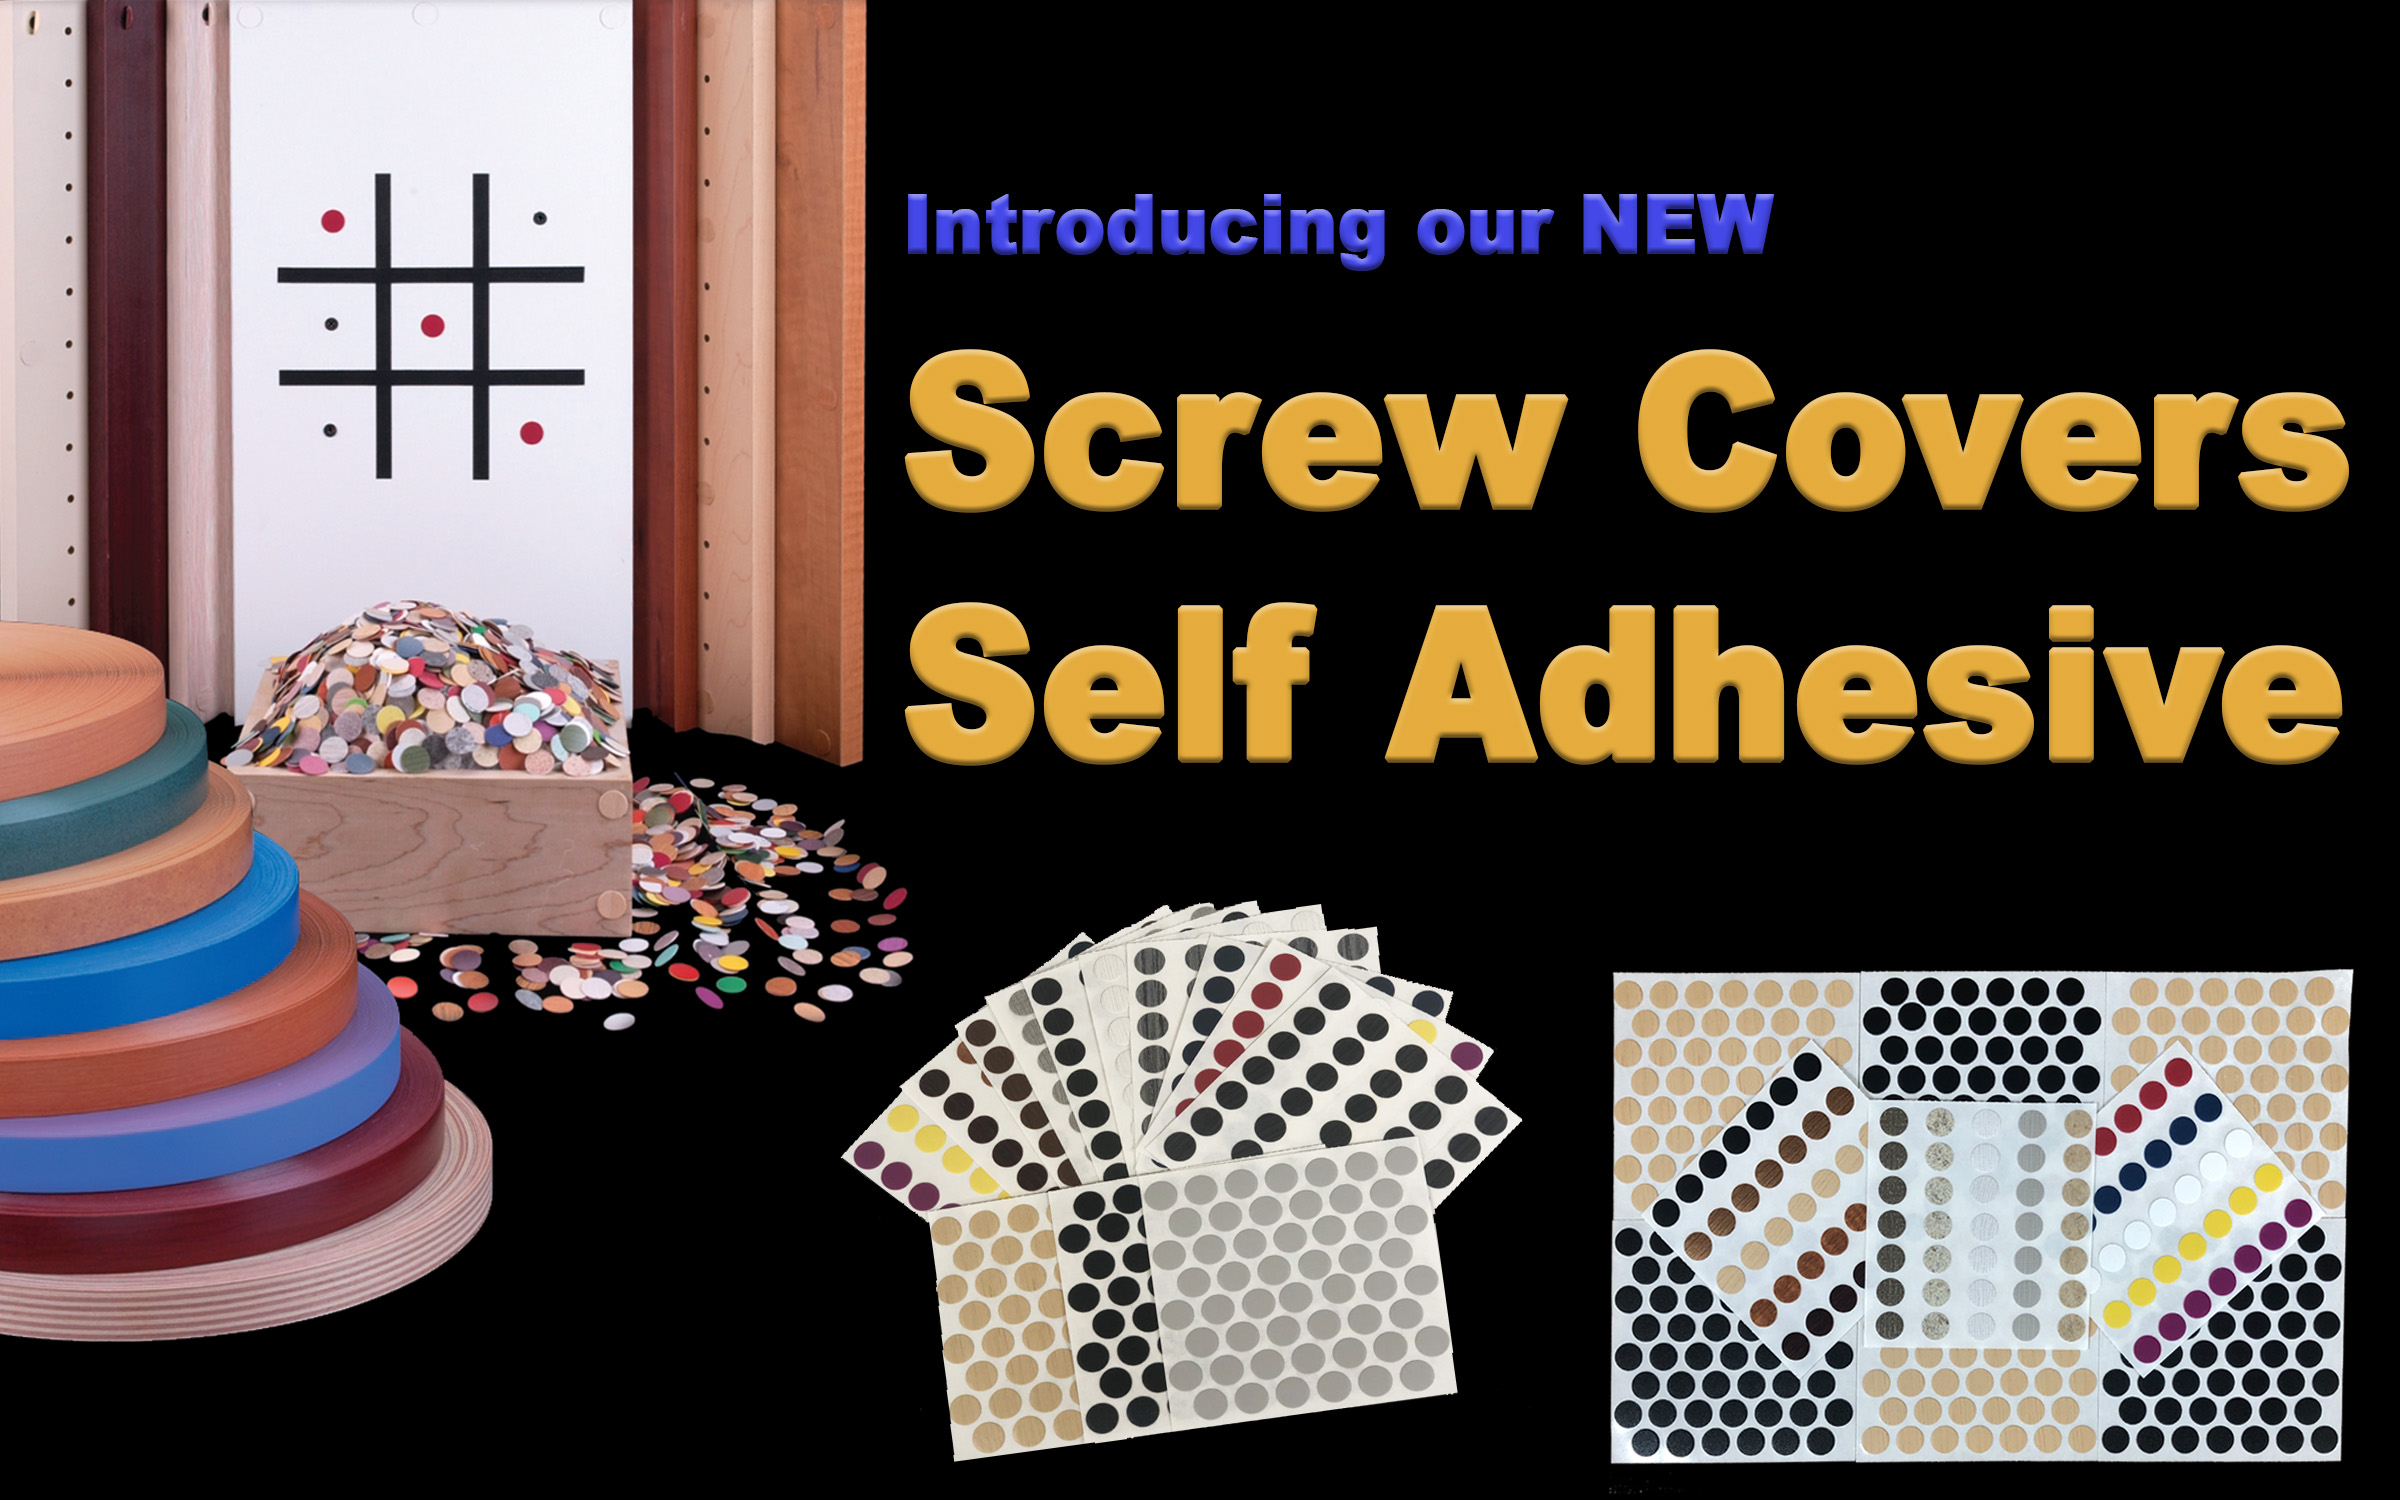 Screw Covers Self Adhesive